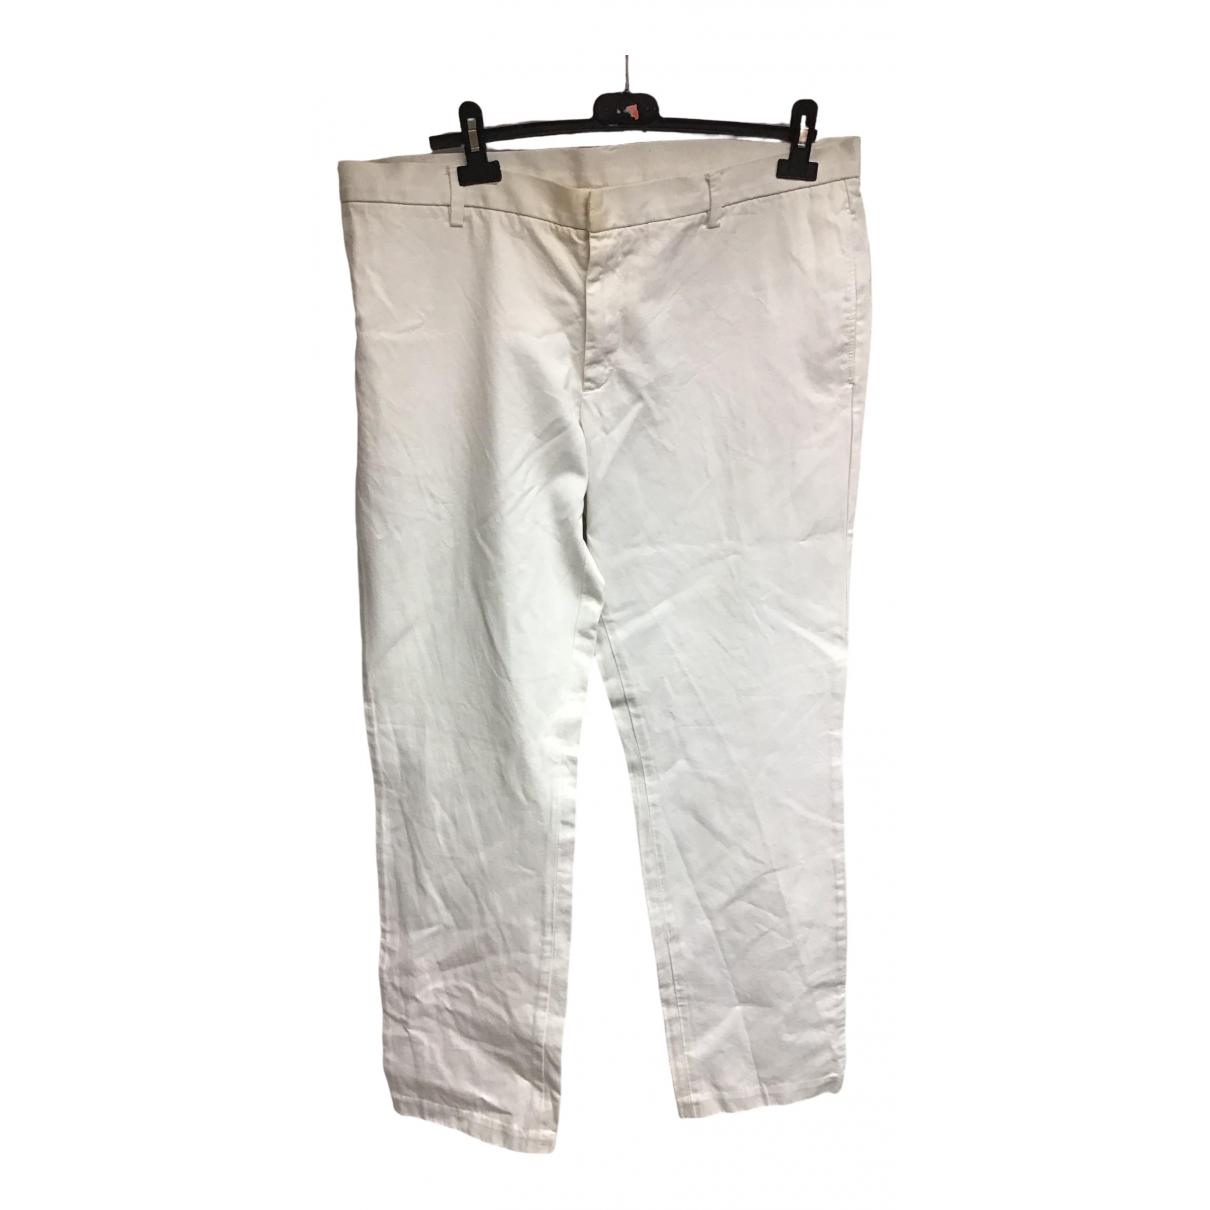 Pantalones en Algodon Blanco Just Cavalli